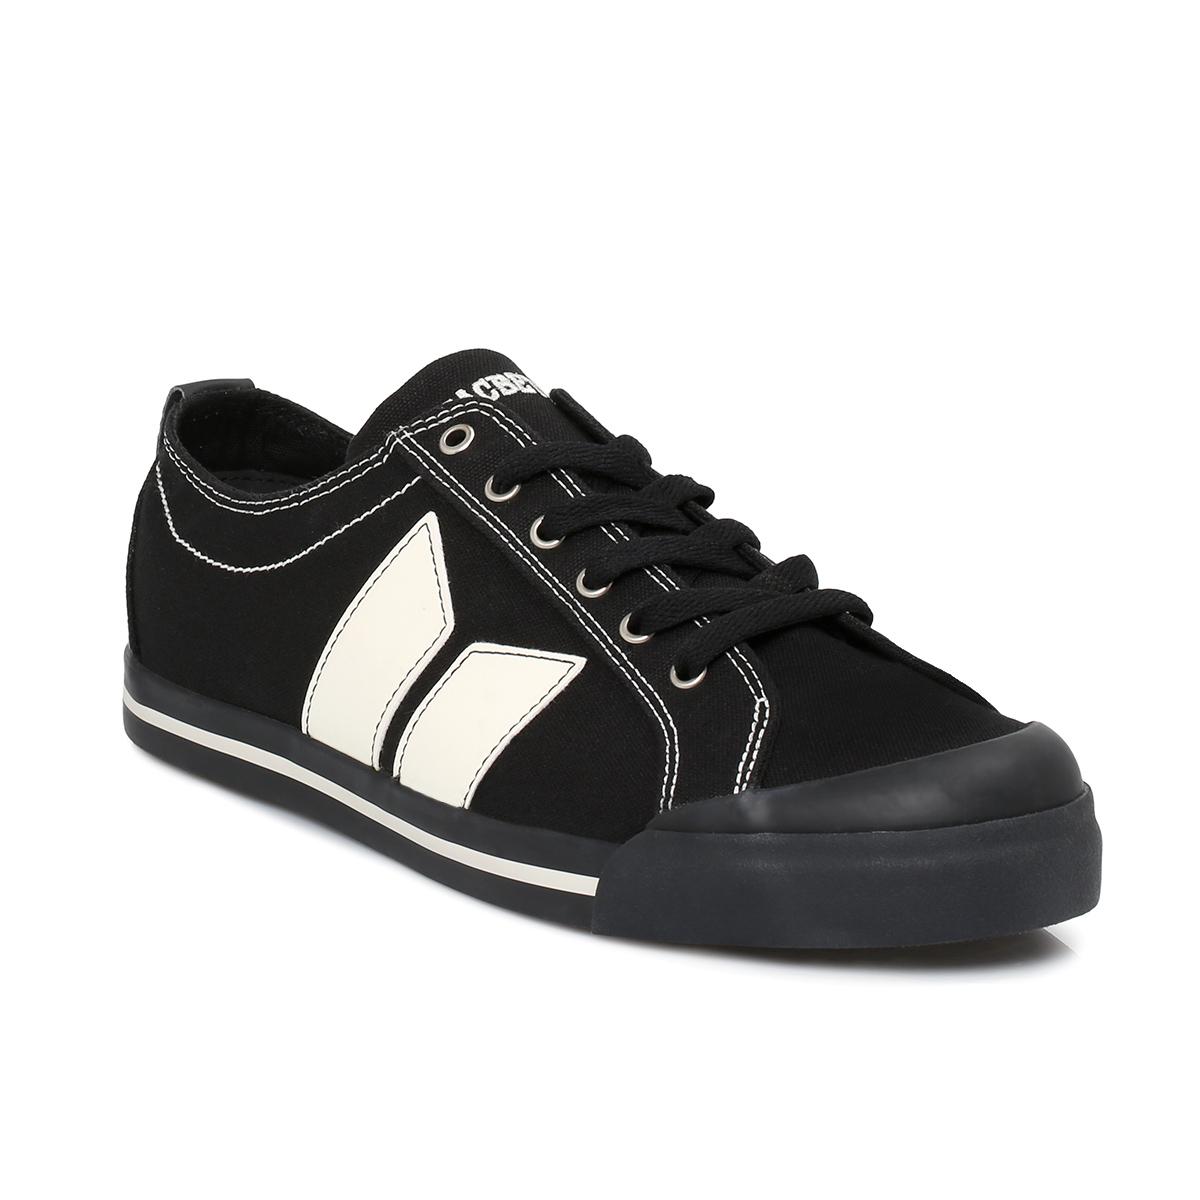 Mens Womens Black Canvas Pumps Casual Flat Shoes Trainers ... | 1200 x 1200 jpeg 273kB